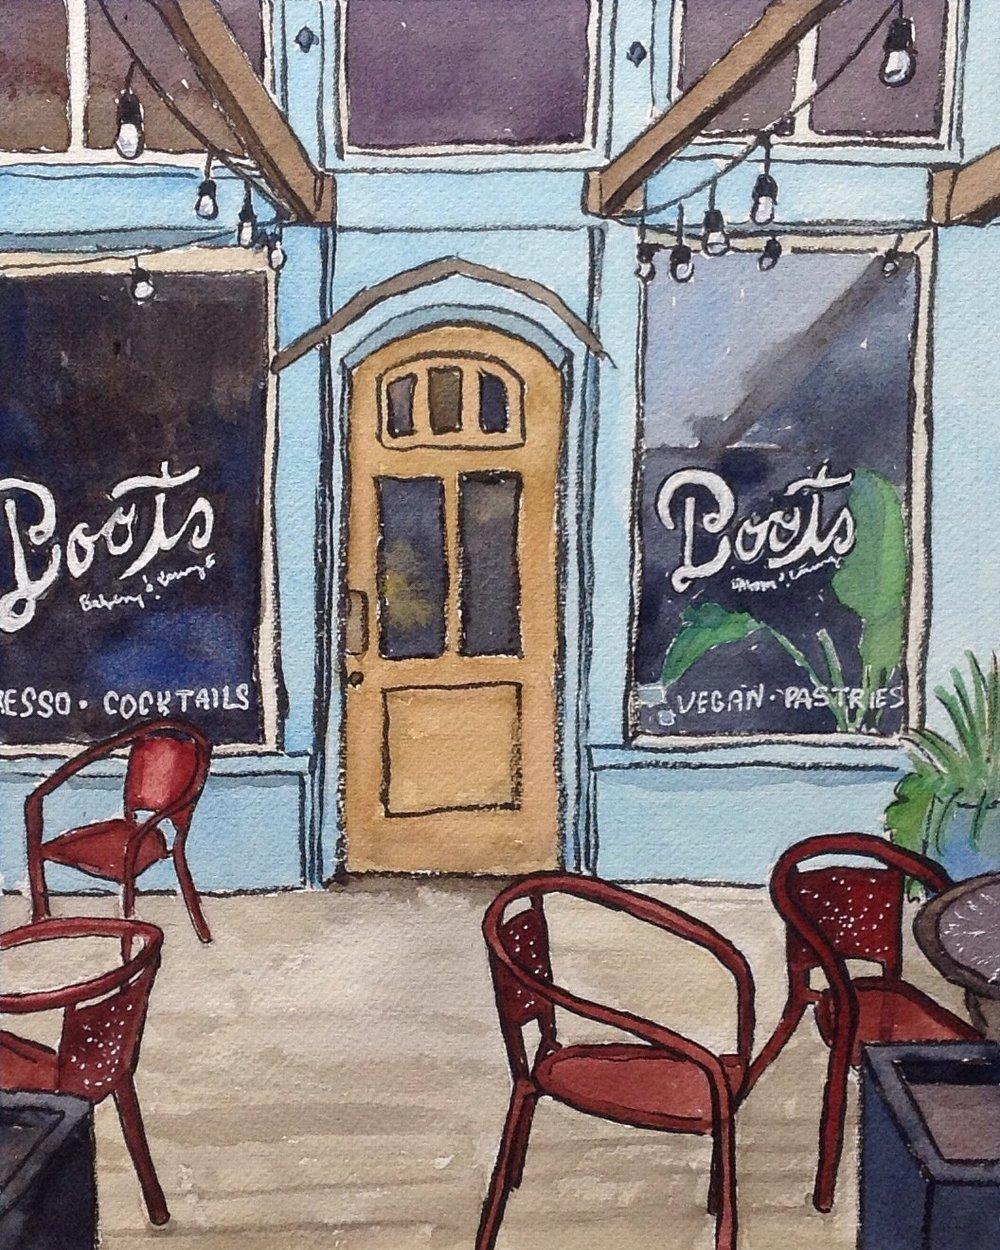 painting_Boots_Bakery_300dpi.JPG